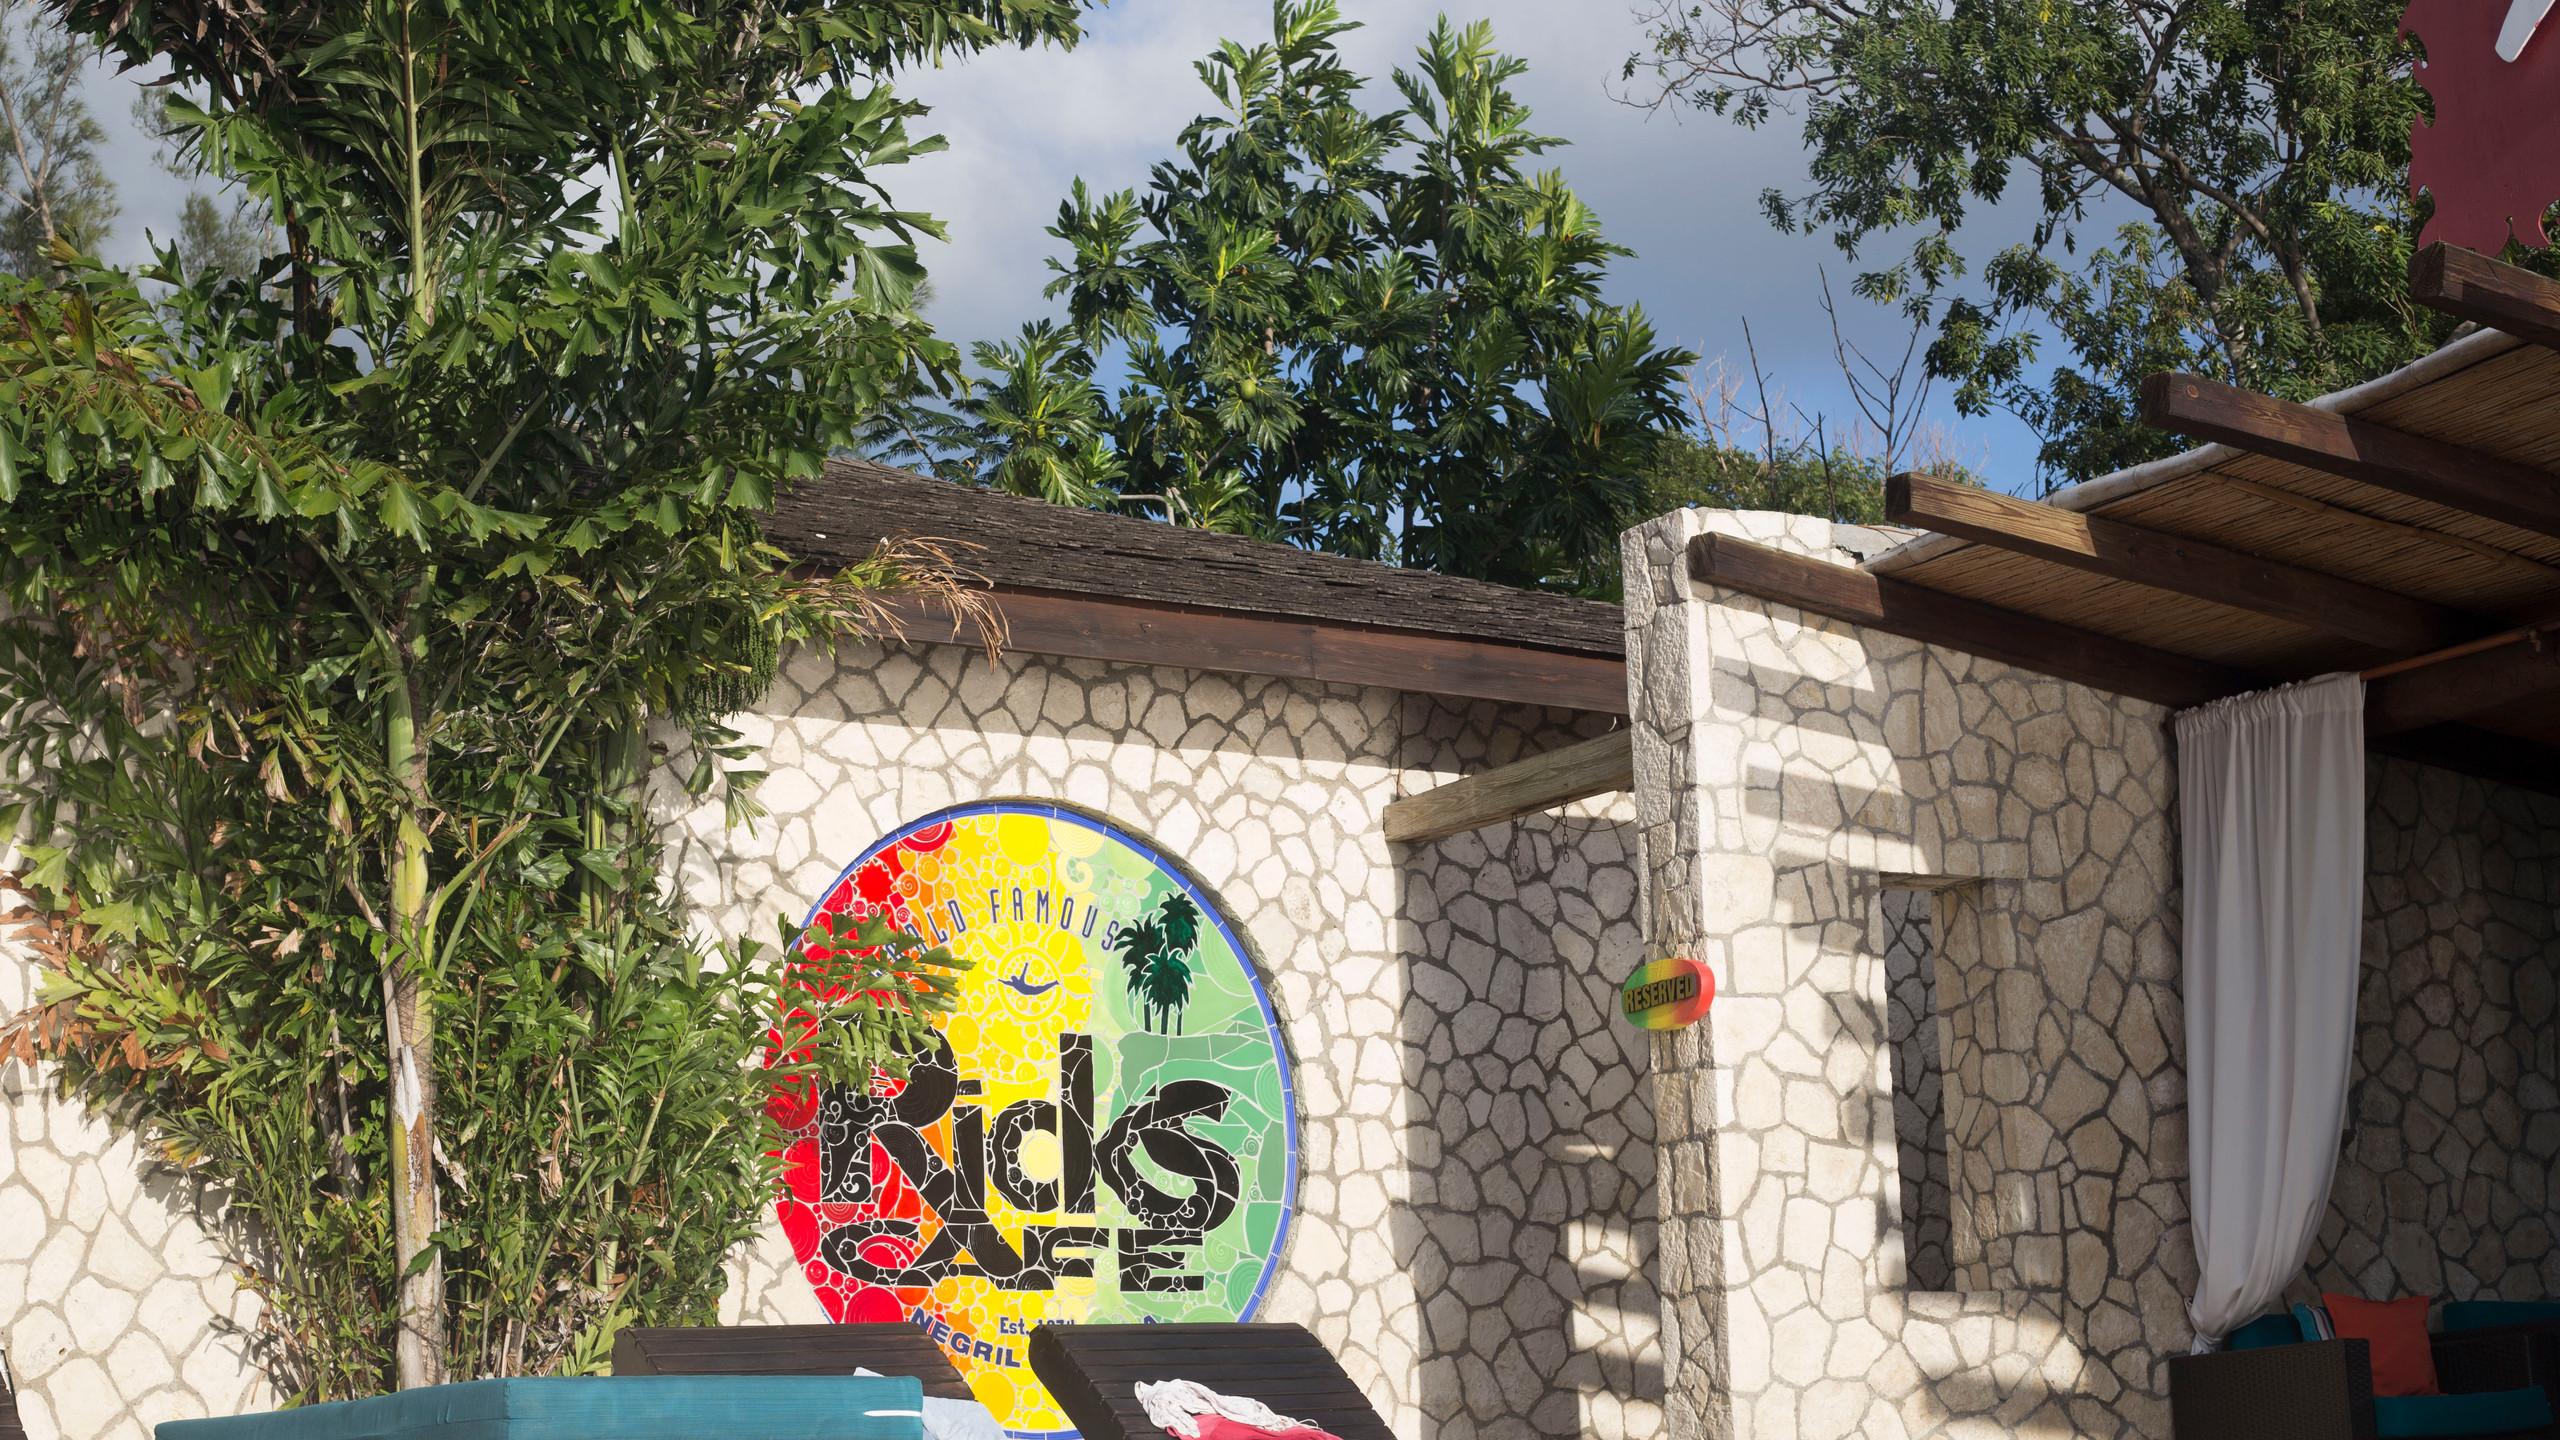 Ricks Cafe entrance